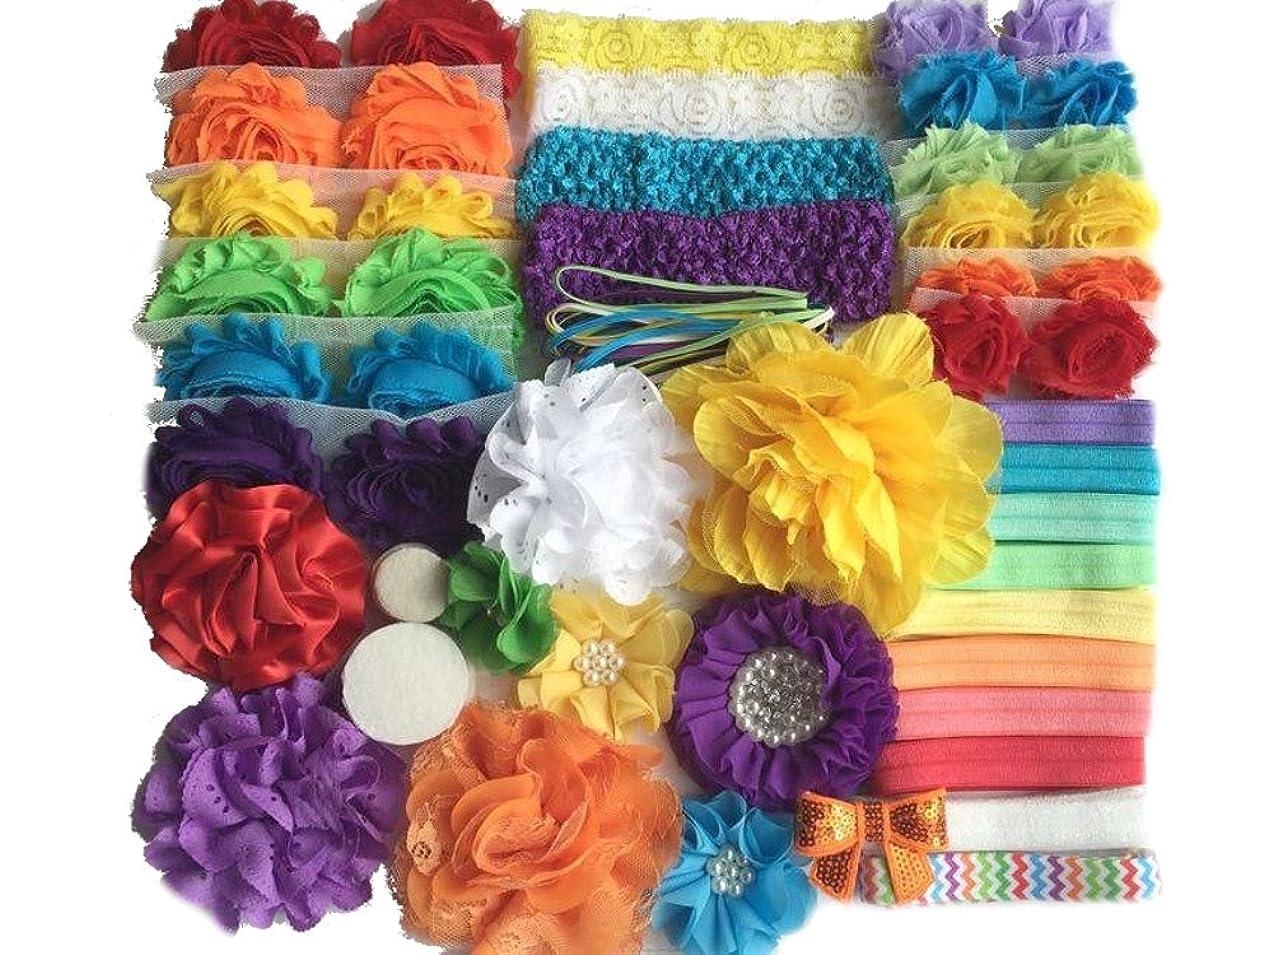 Bowtique Emilee Baby Shower Headband Kit DIY Headband Kit makes 30 Headbands - Rainbow